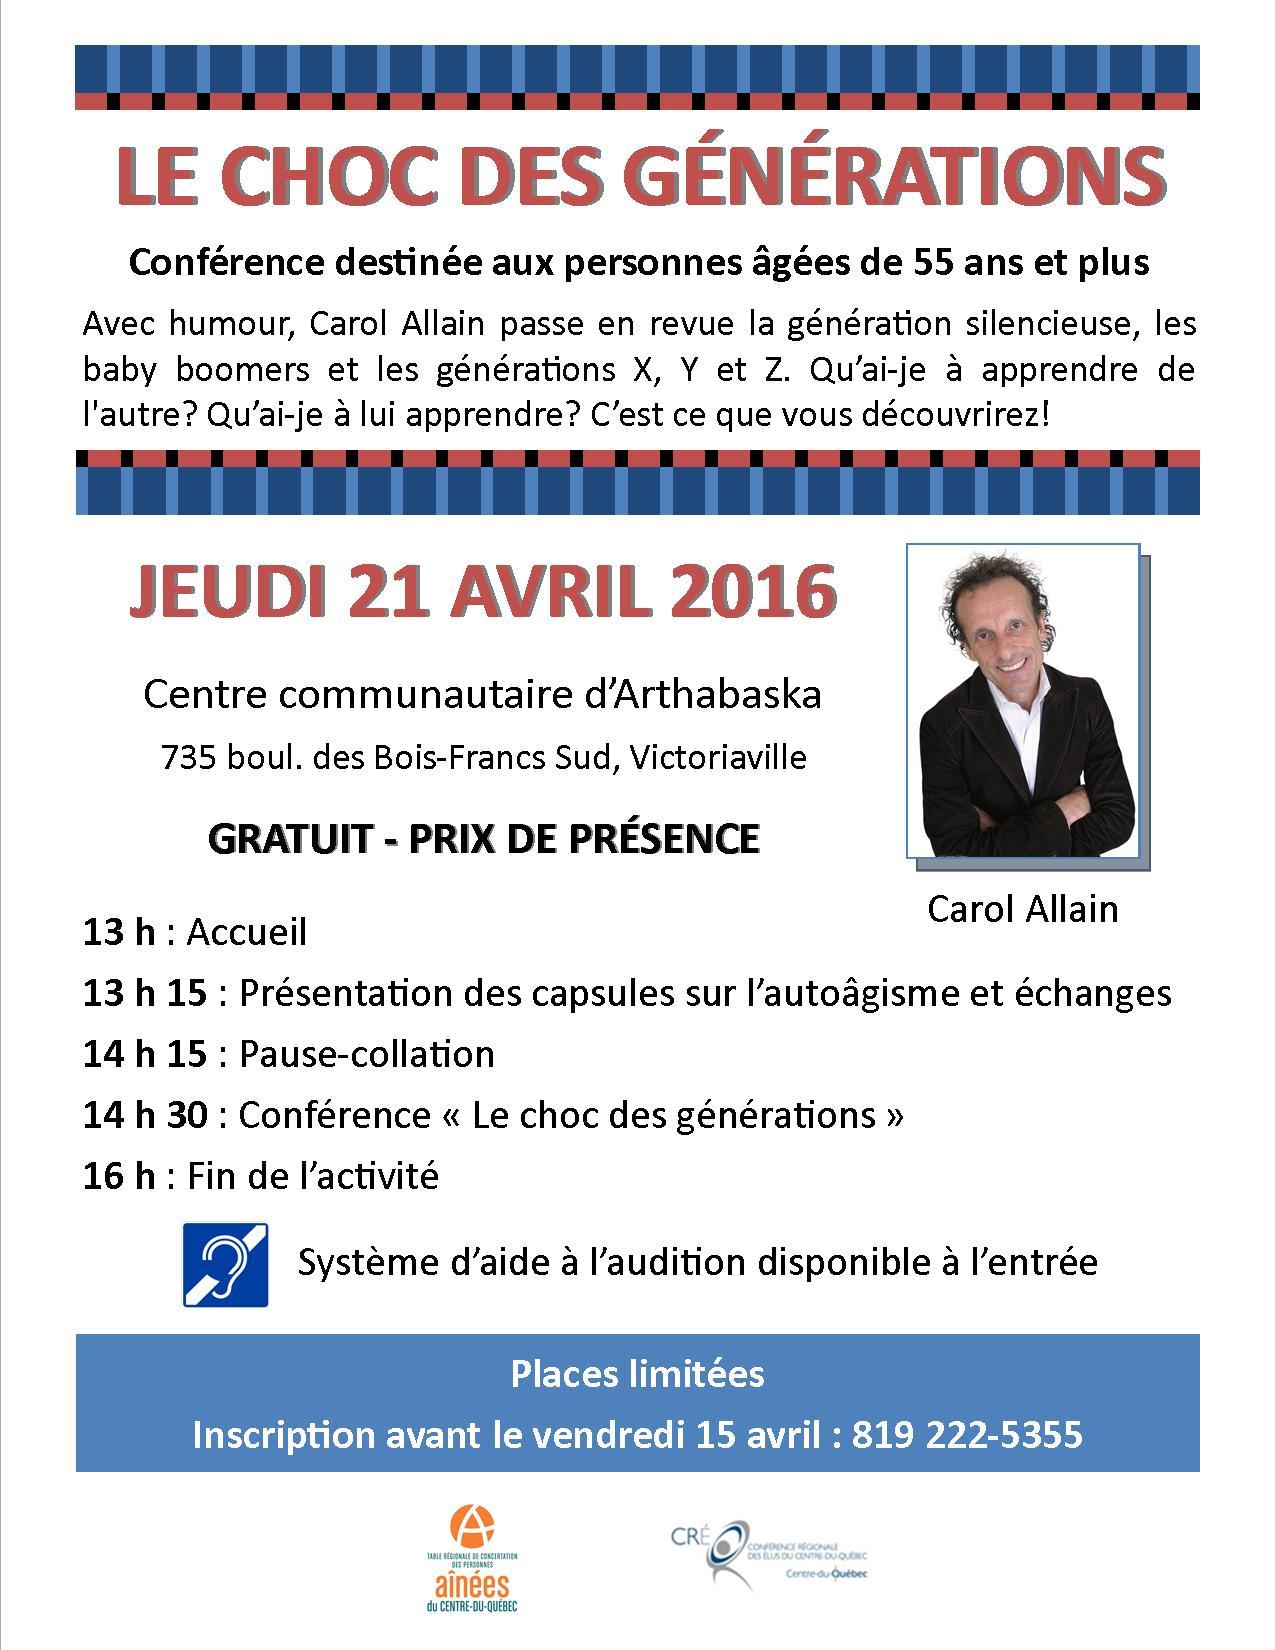 invitation-conference-choc-des-generations-aines